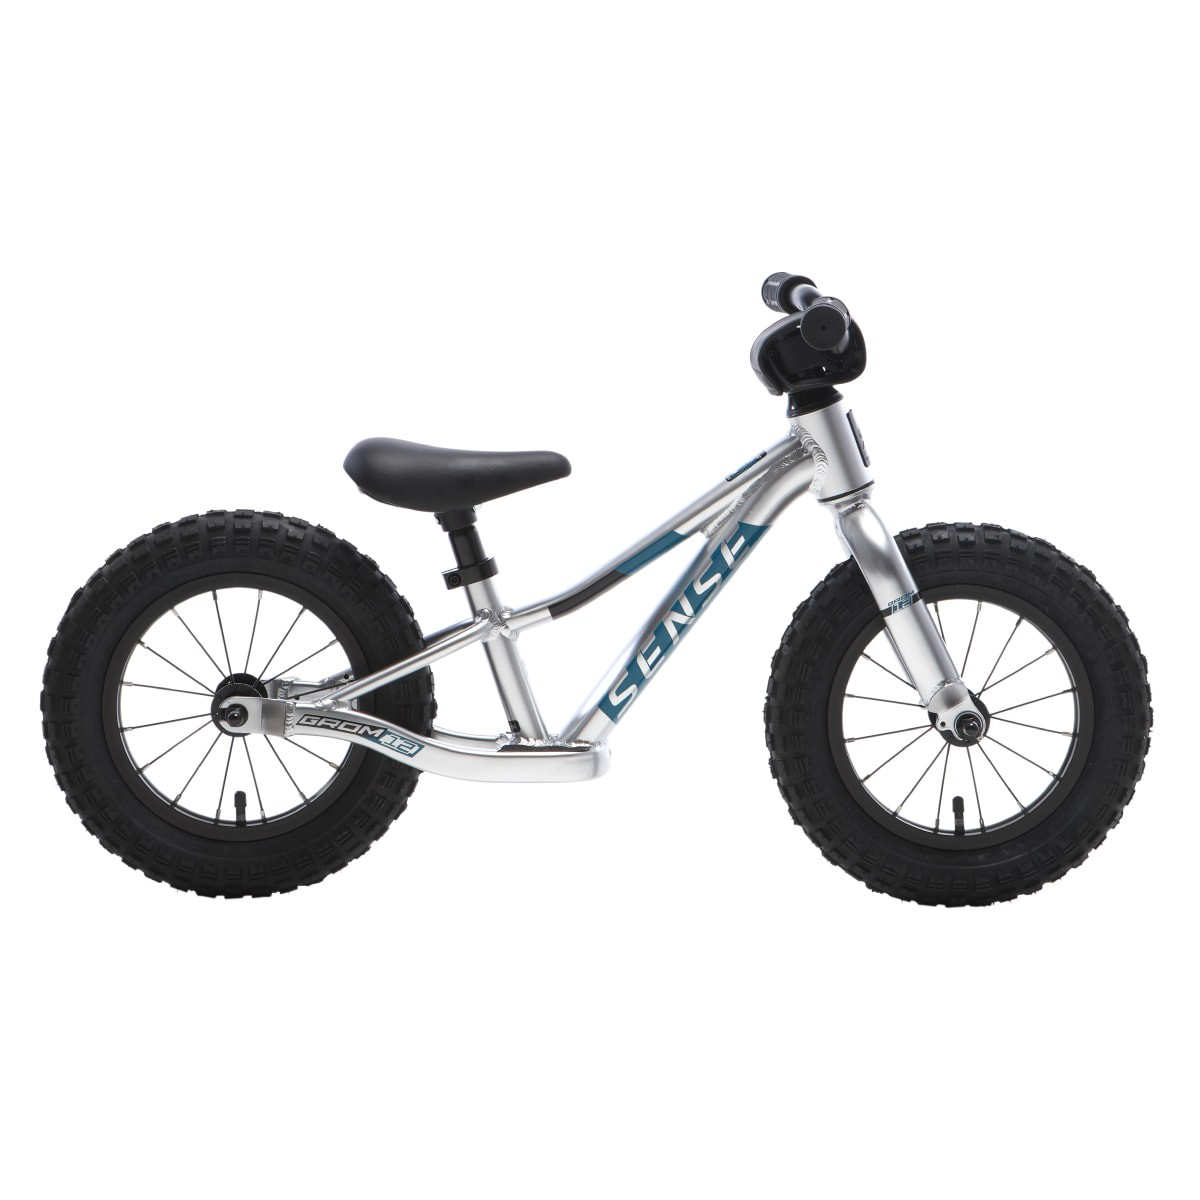 Bike Sense Grom 12 2021 Aluminio e Aqua